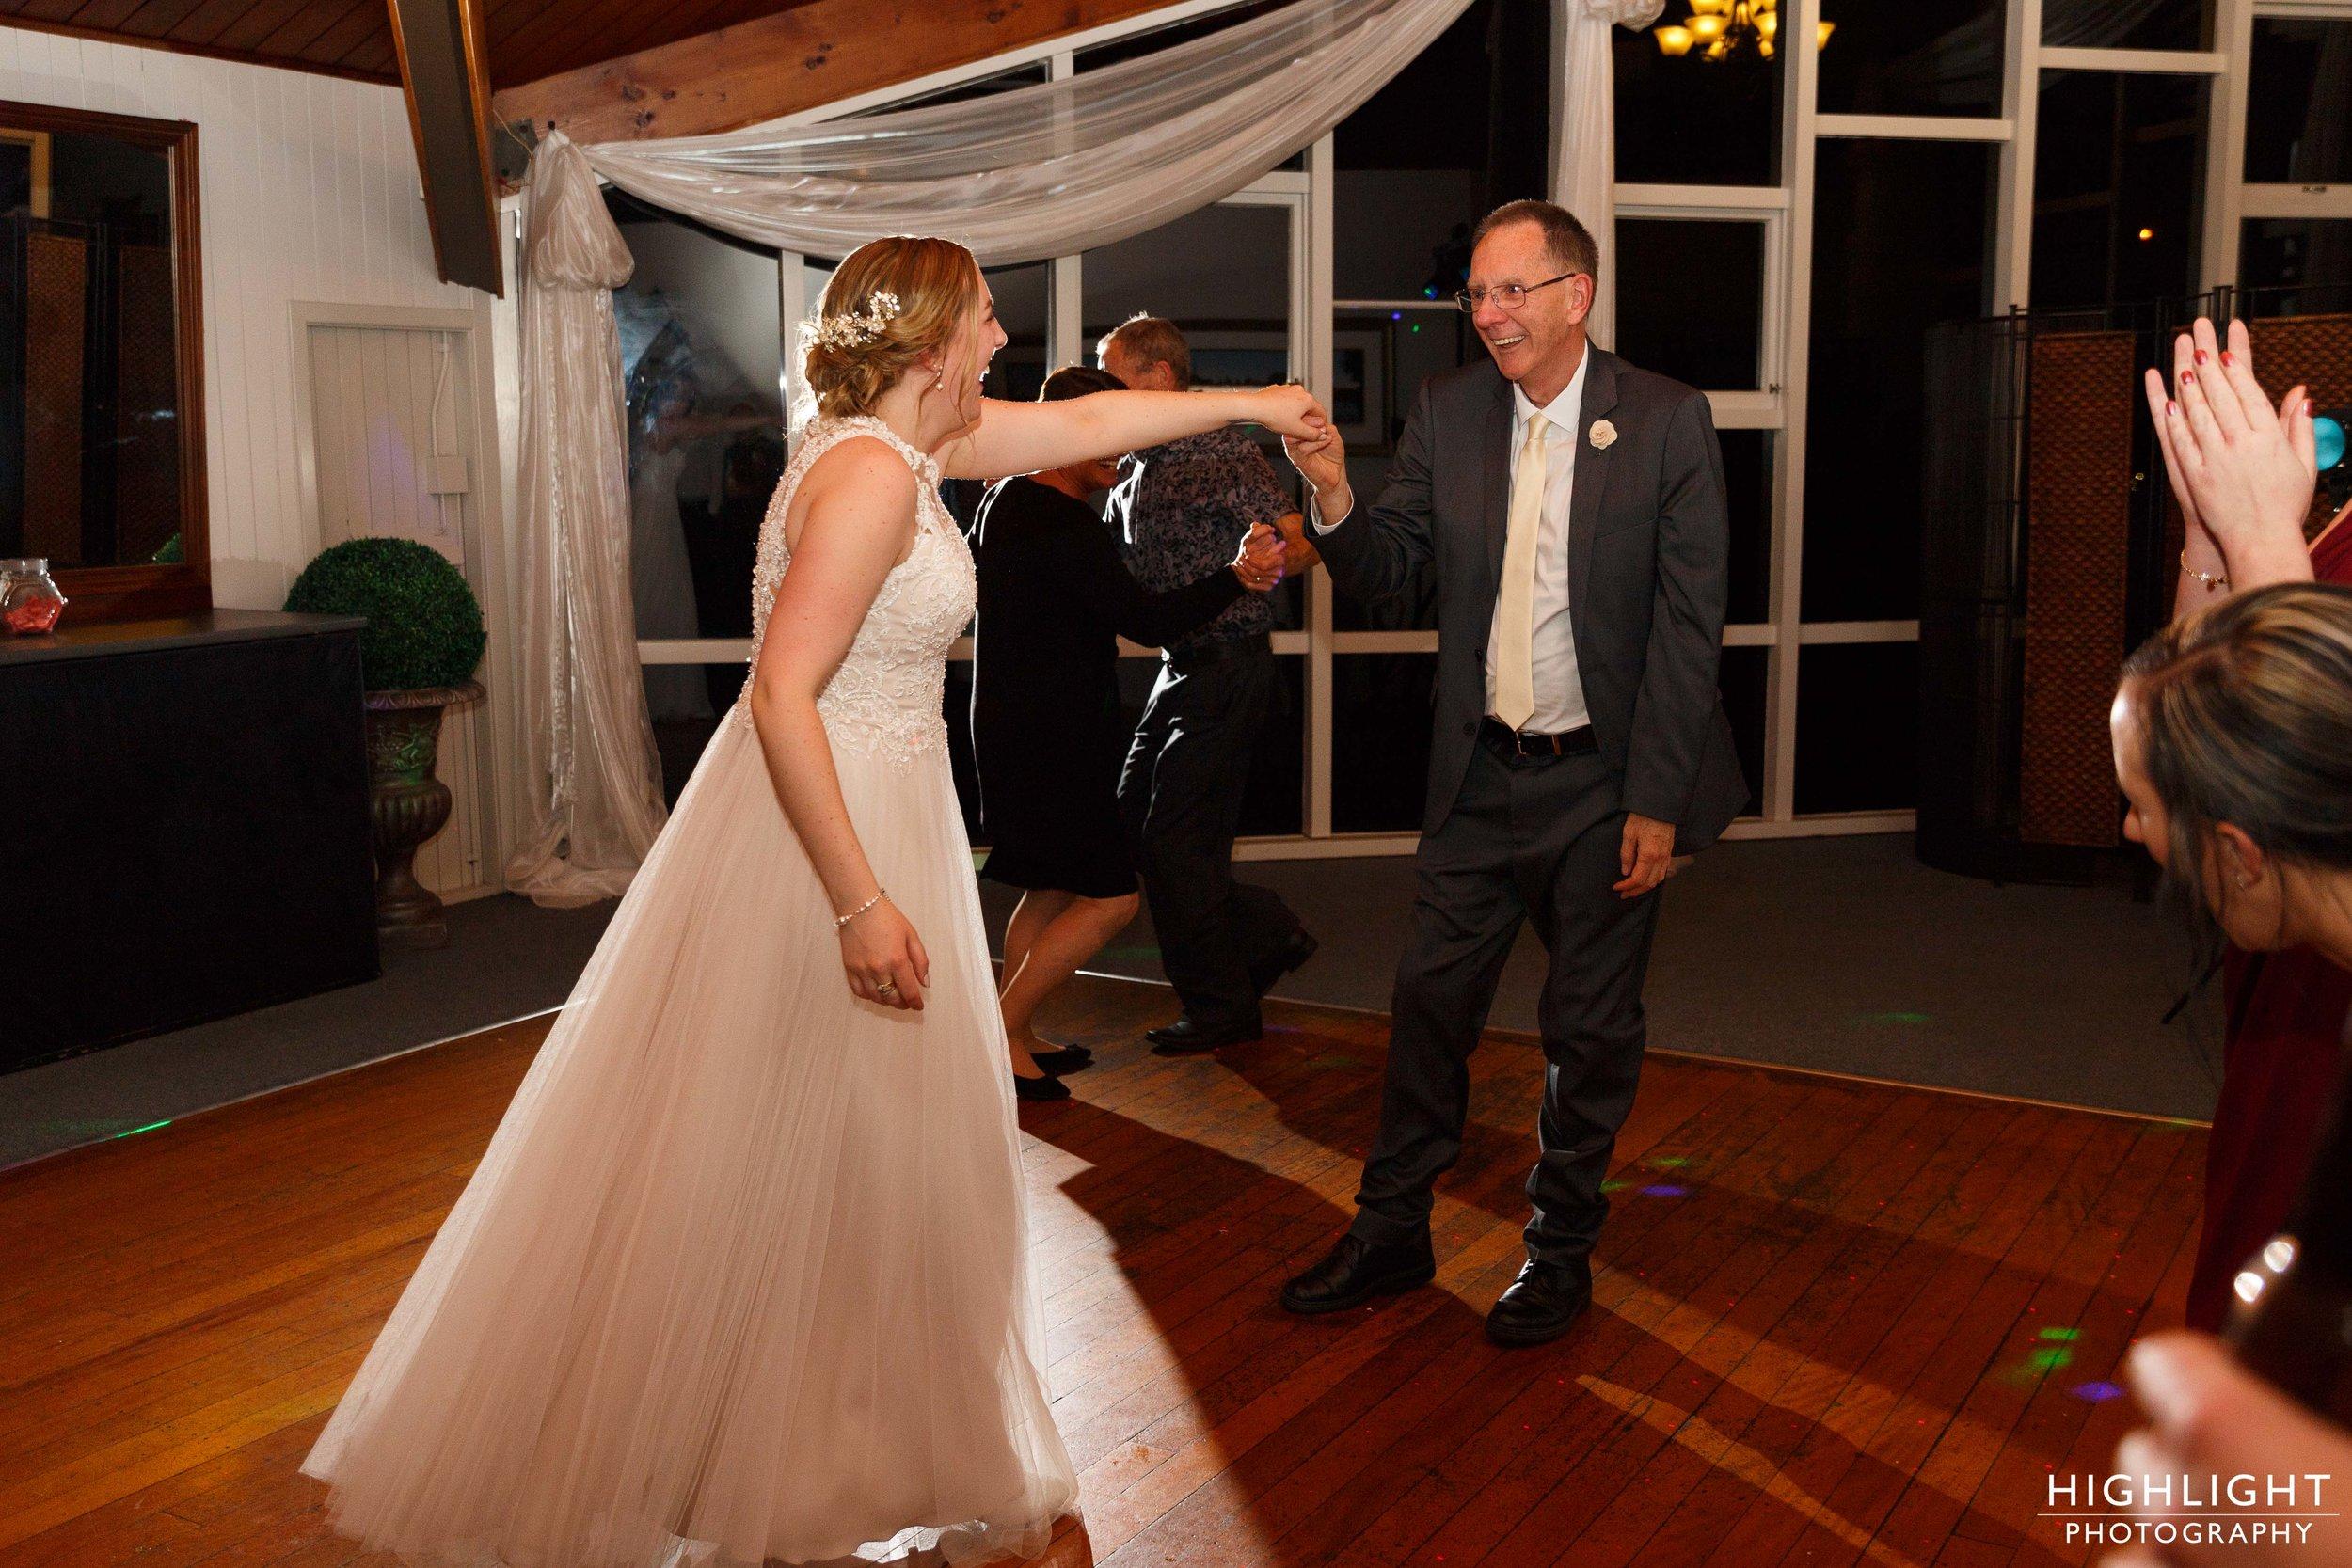 highlight-wedding-photography-palmerston-north-new-zealand-manawatu-chalet-147.jpg